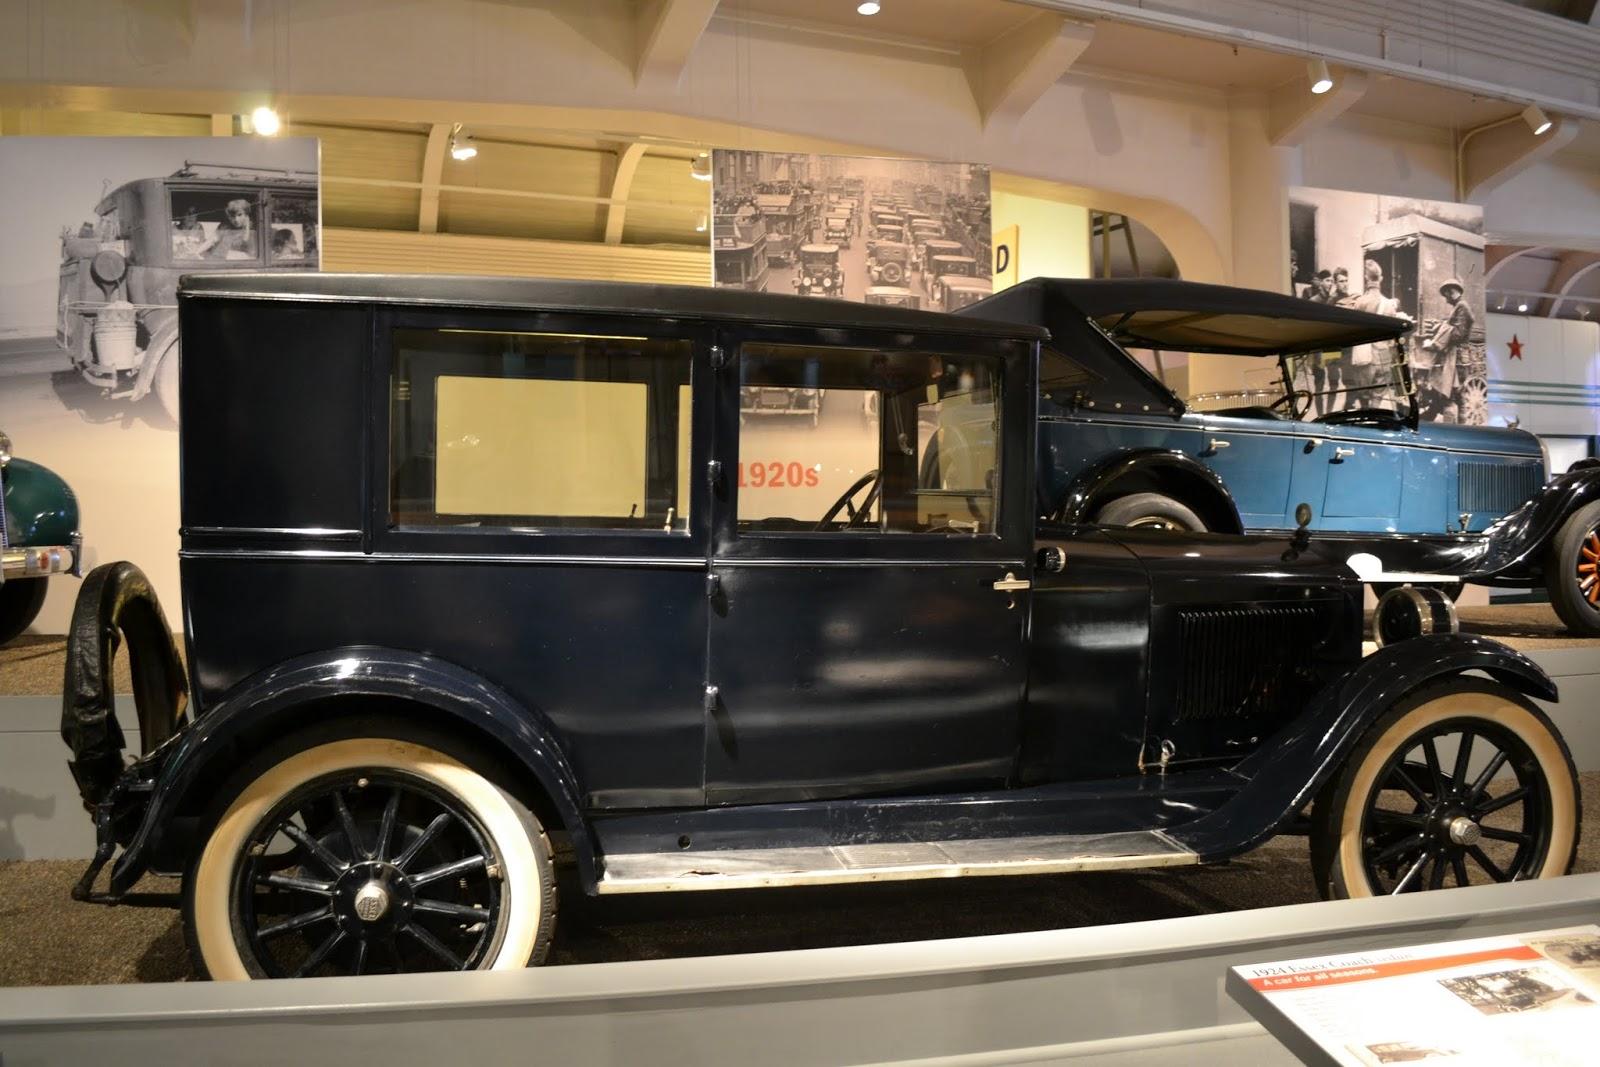 Essex Coach, 1924 года. Музей Генри Форда. Дирборн, Мичиган (Henry Ford Museum, Dearborn, MI)